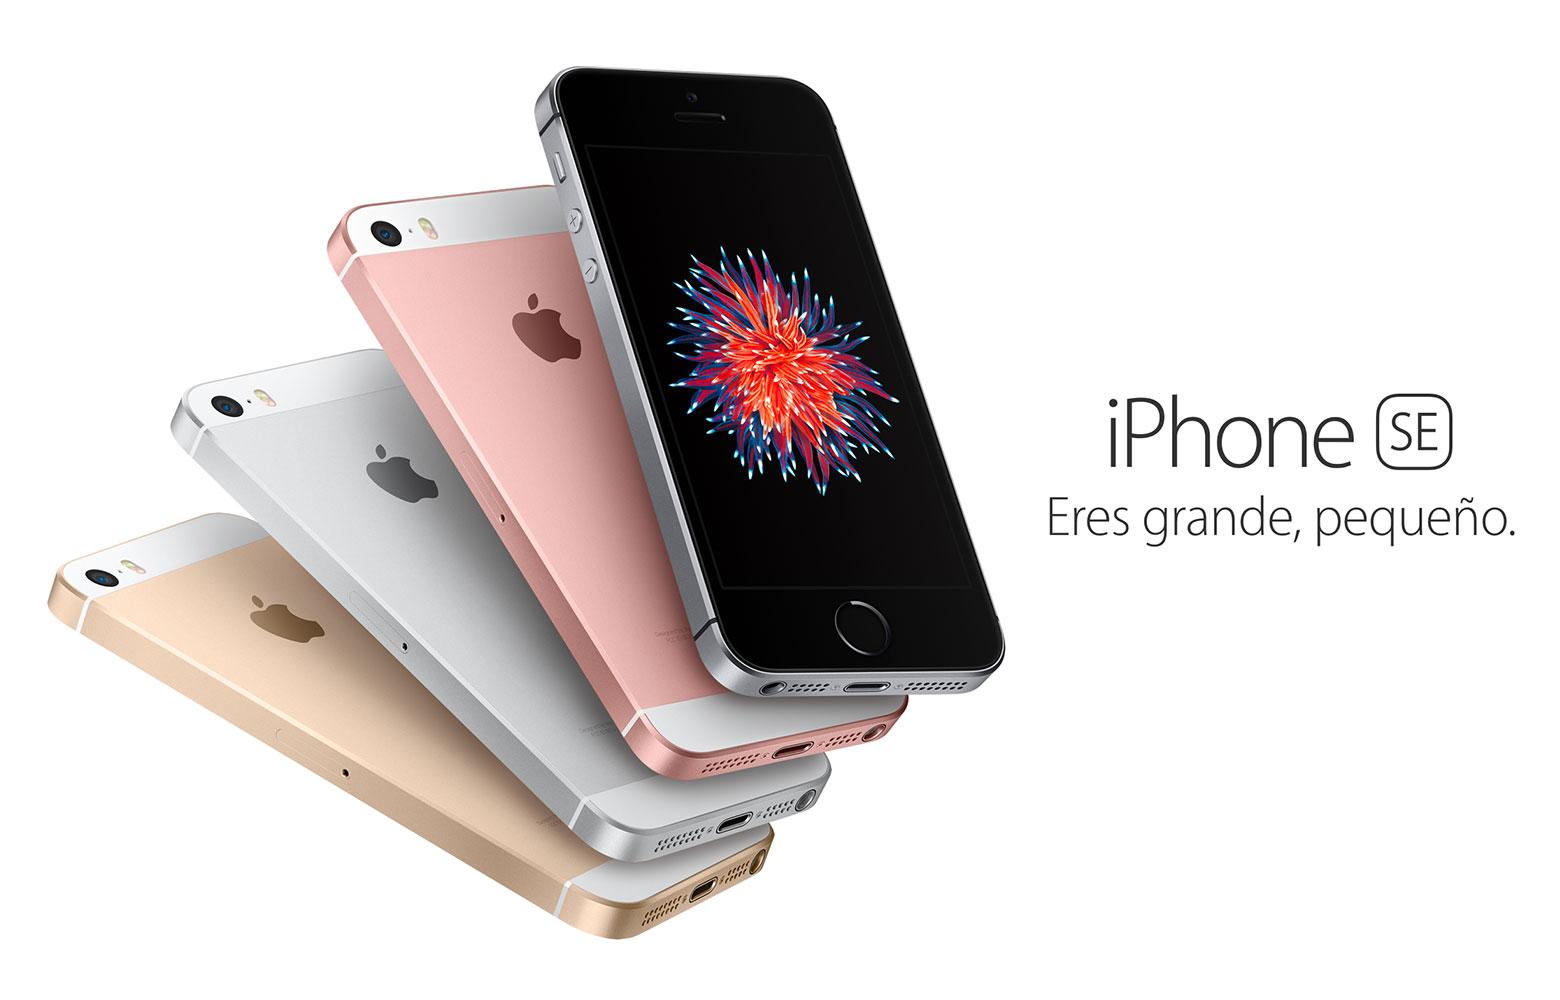 iphone-se-precio-libre-espana-grande-pequeno